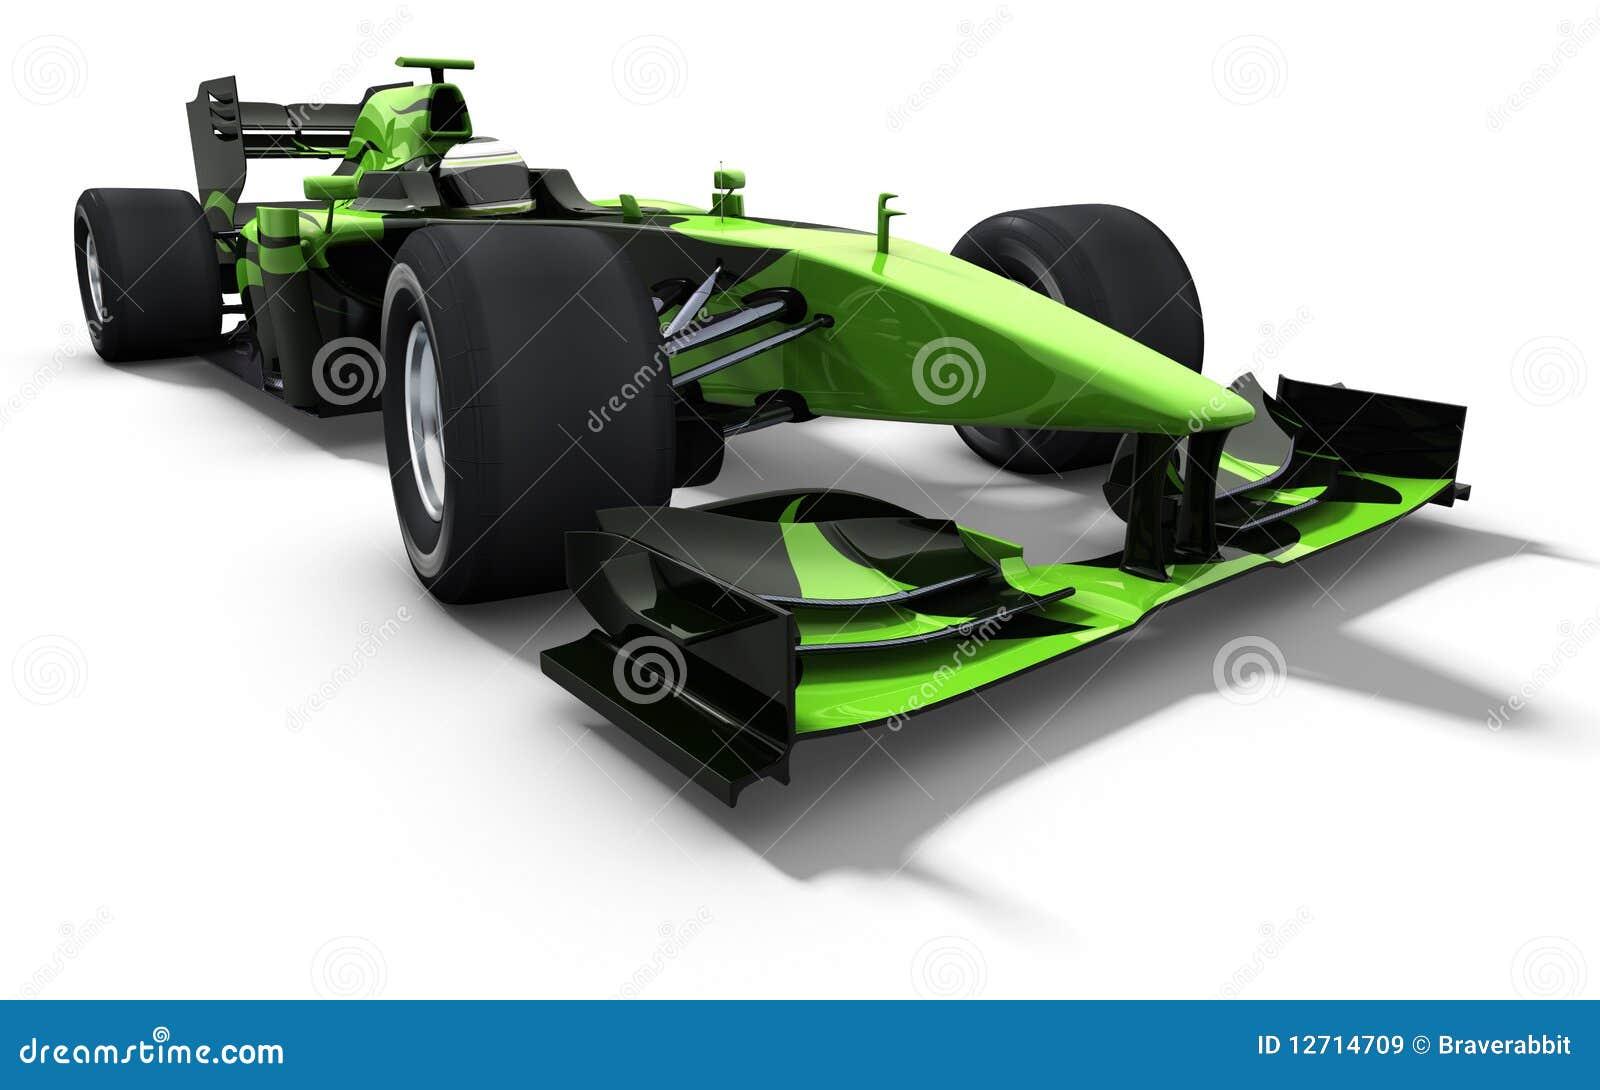 Race car - green and black stock illustration. Illustration of auto ...